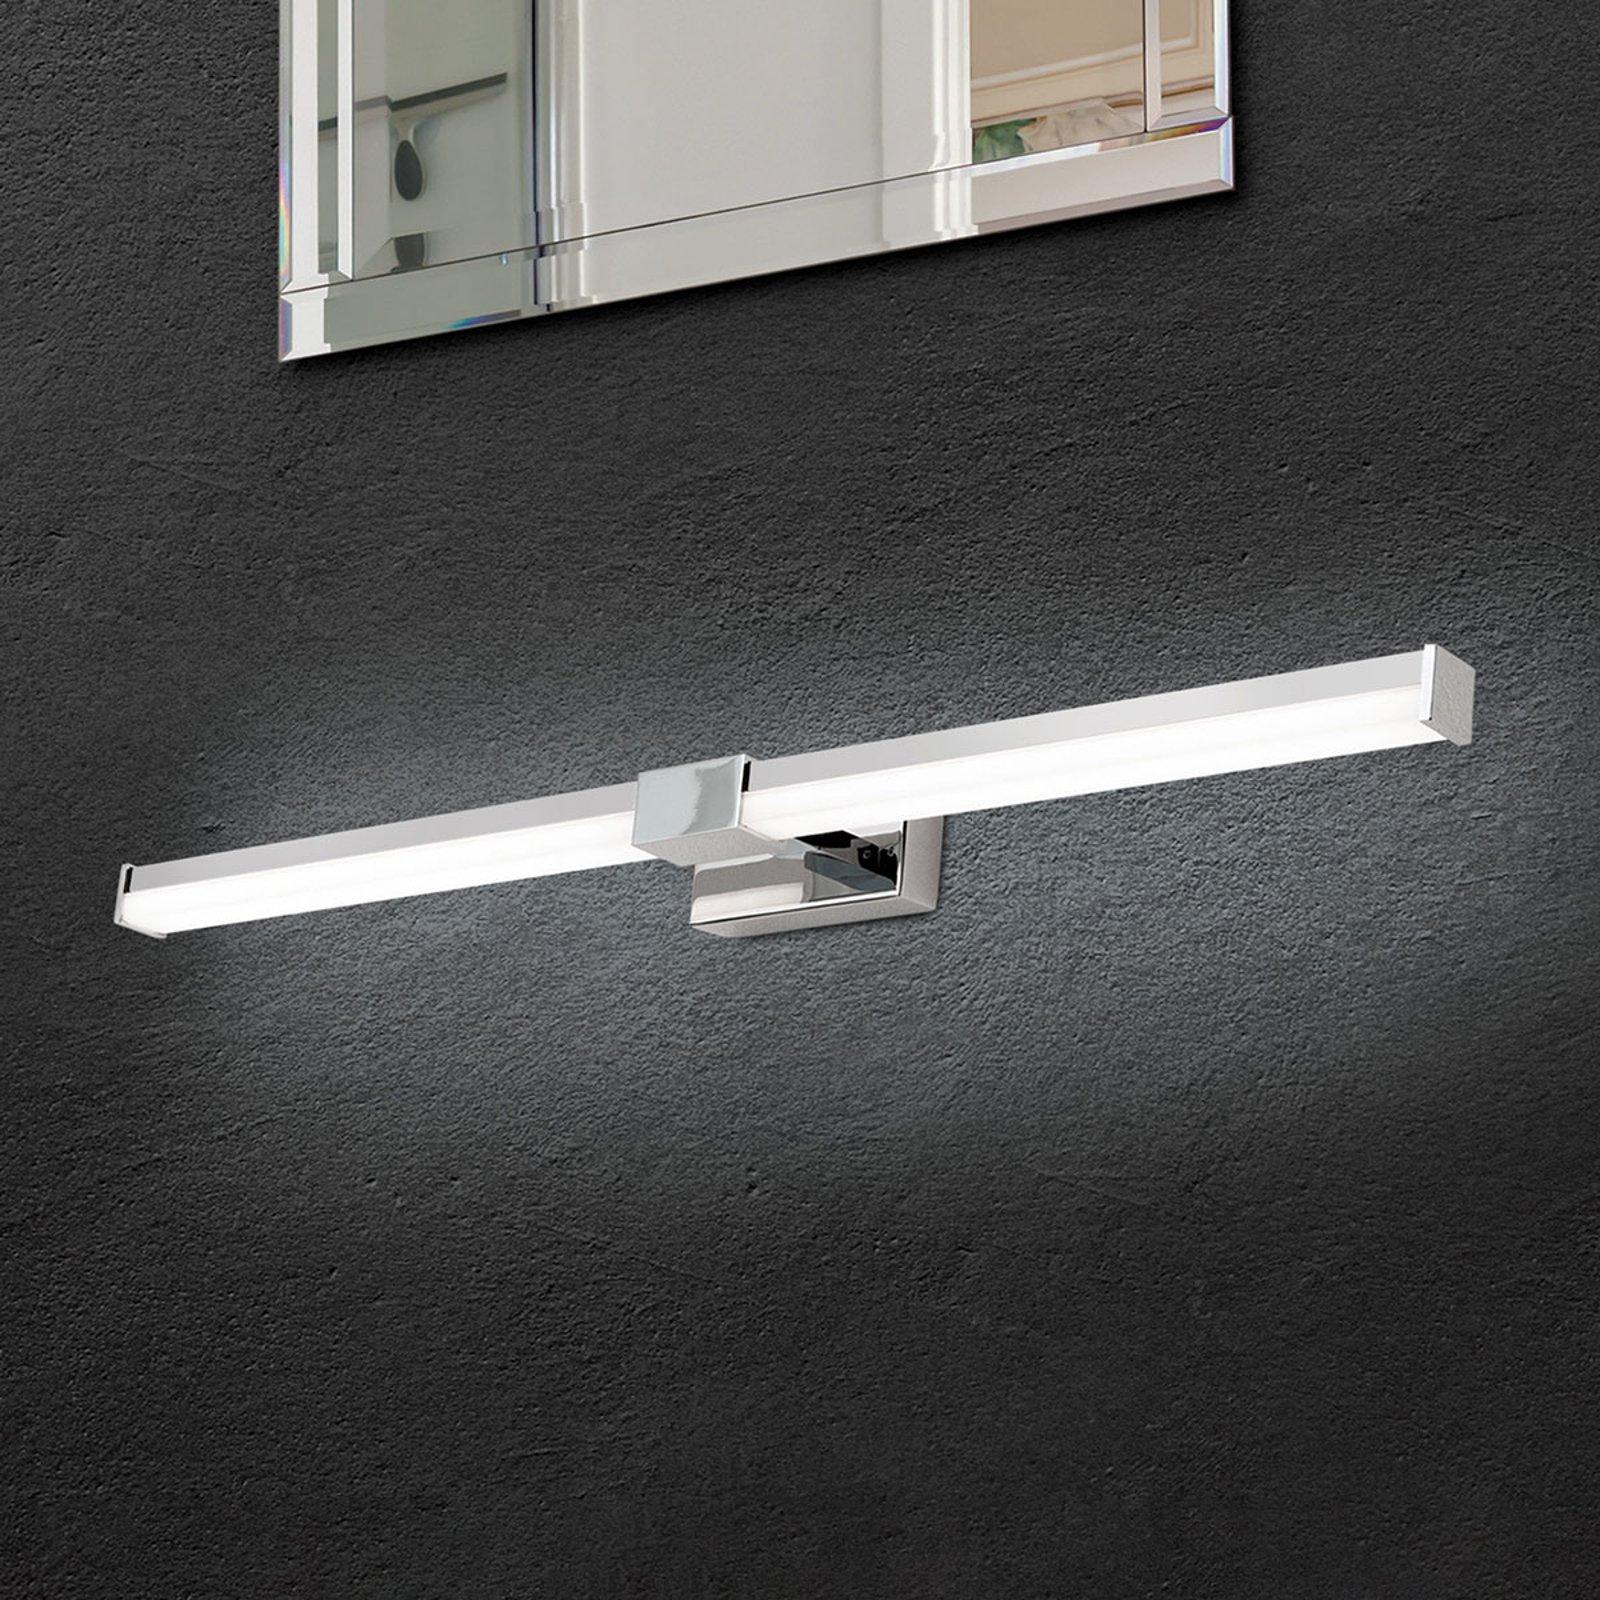 Speillampe til bad Argo med LED 55,5 cm